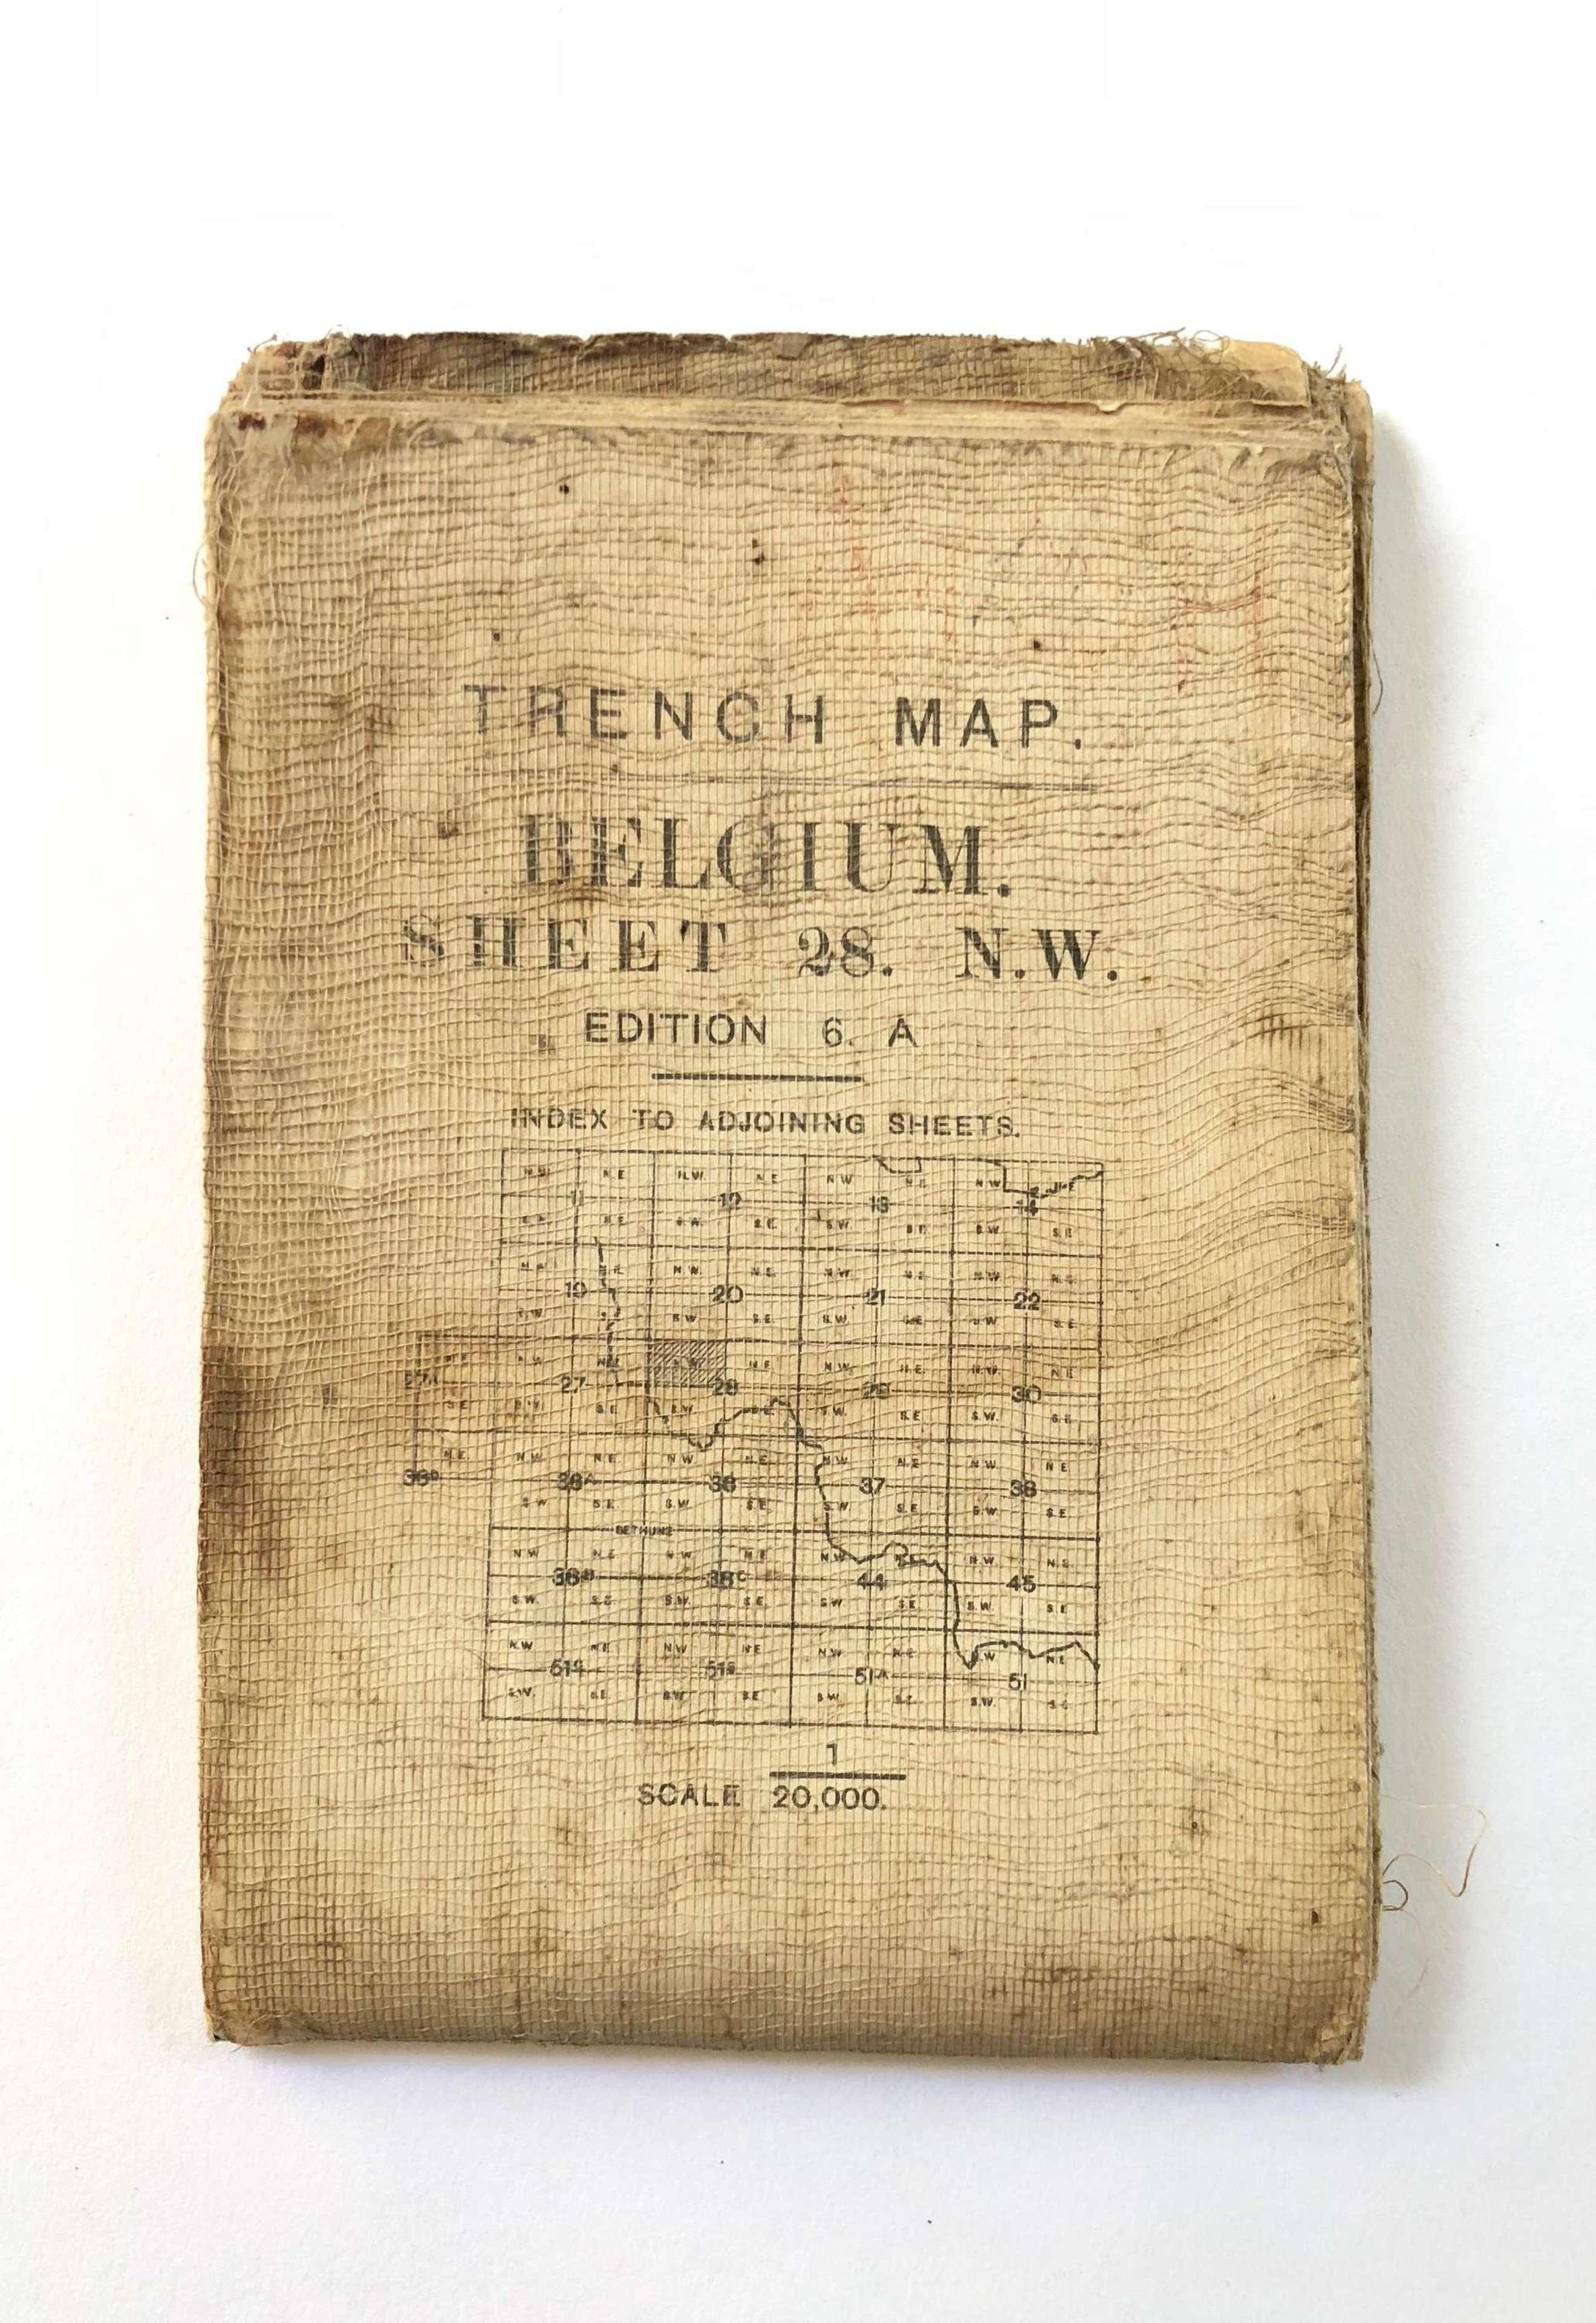 WW1 Trench Fighting Map Ypres Belgium June 1917.